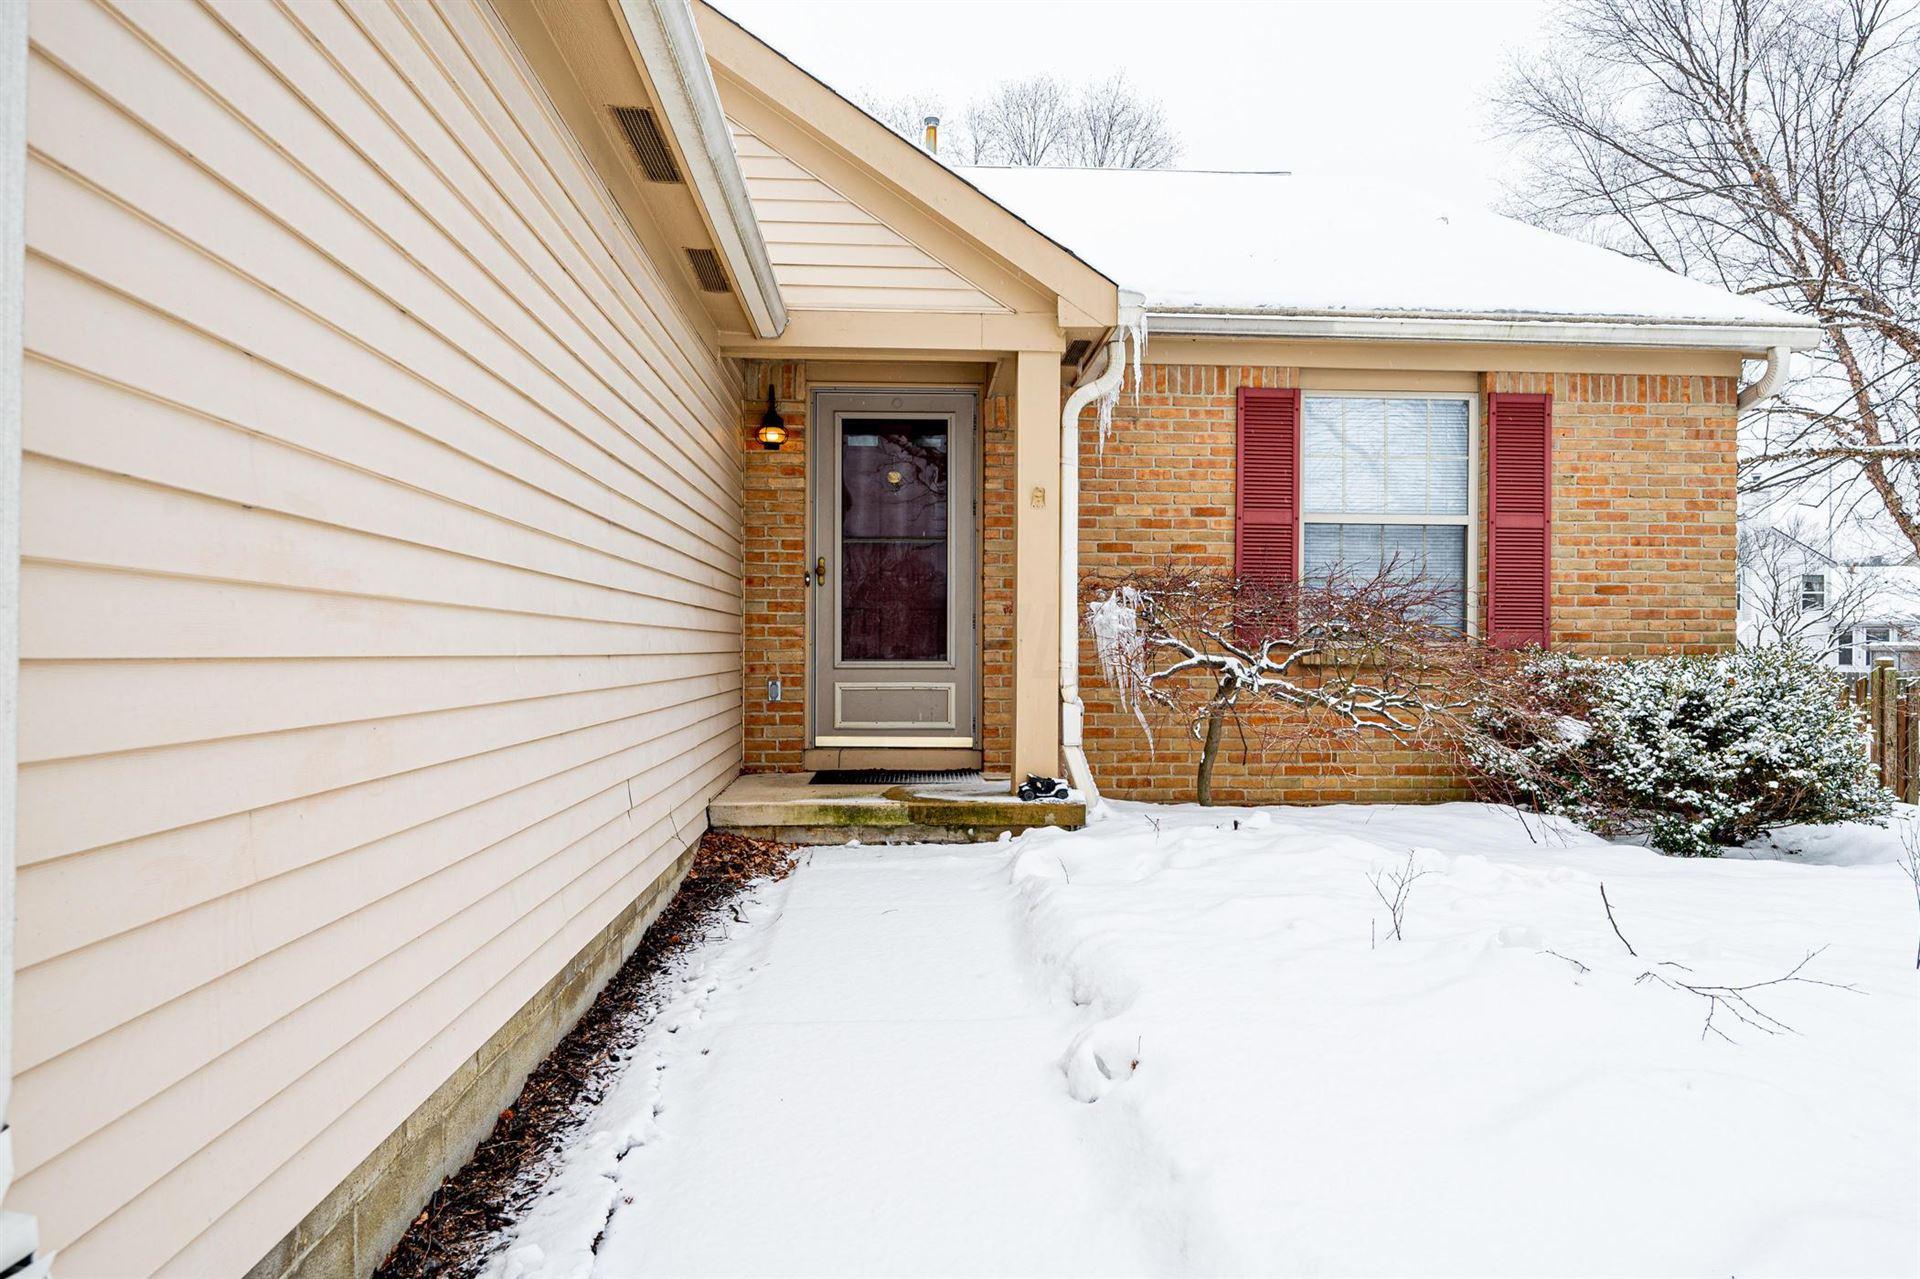 Photo of 1463 Clovenstone Drive, Worthington, OH 43085 (MLS # 221005144)